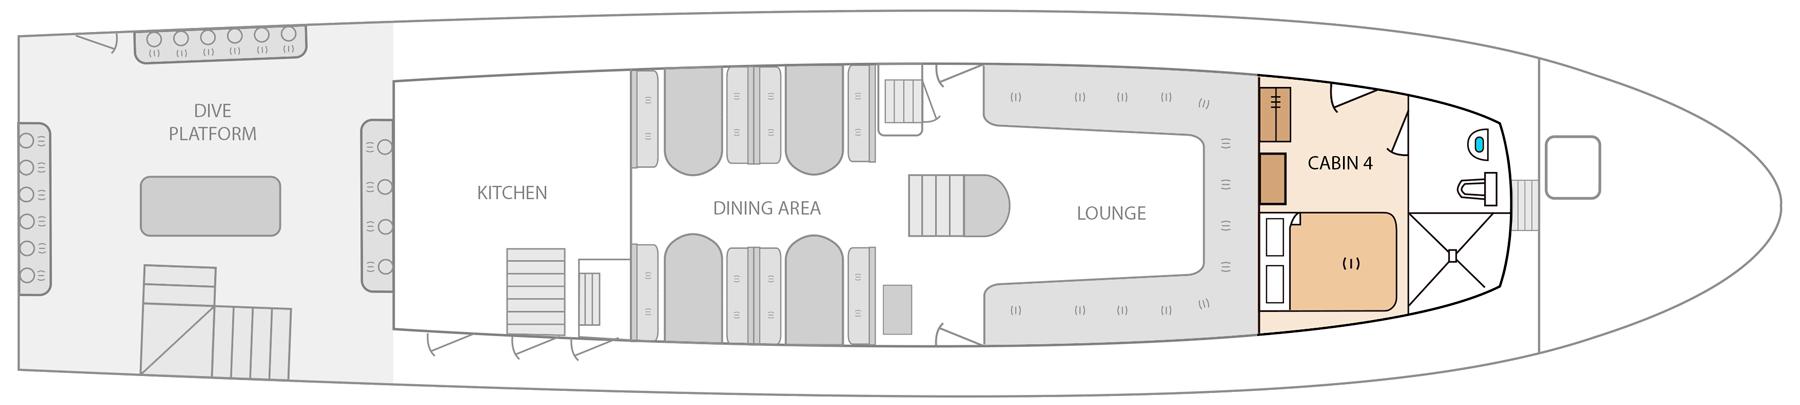 main deck aqua yacht